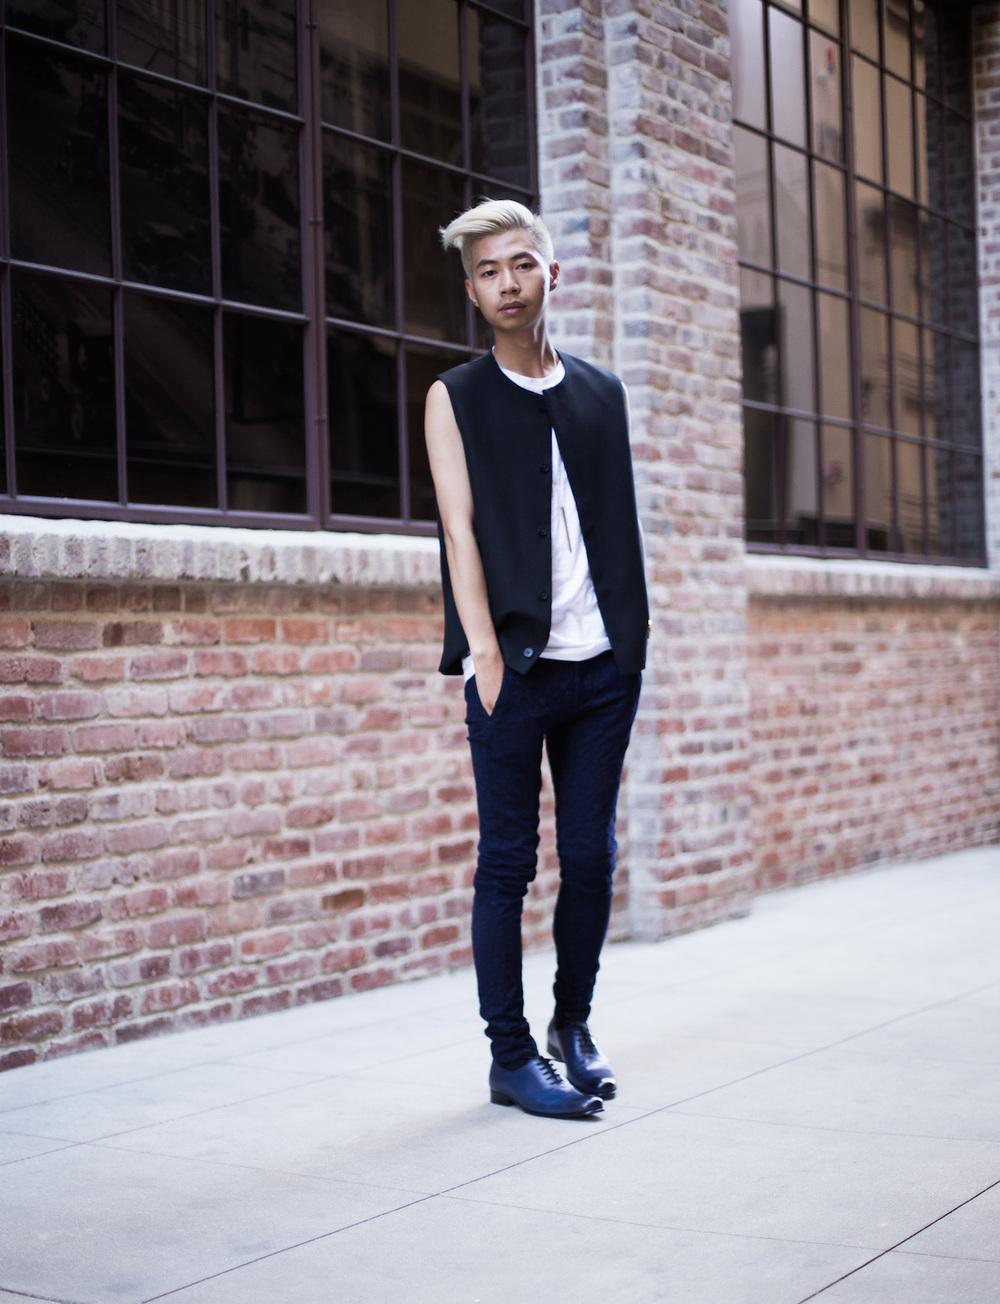 cos-sleeveless-blazer-unisex-menswear-mybelonging-tommylei-18.jpg